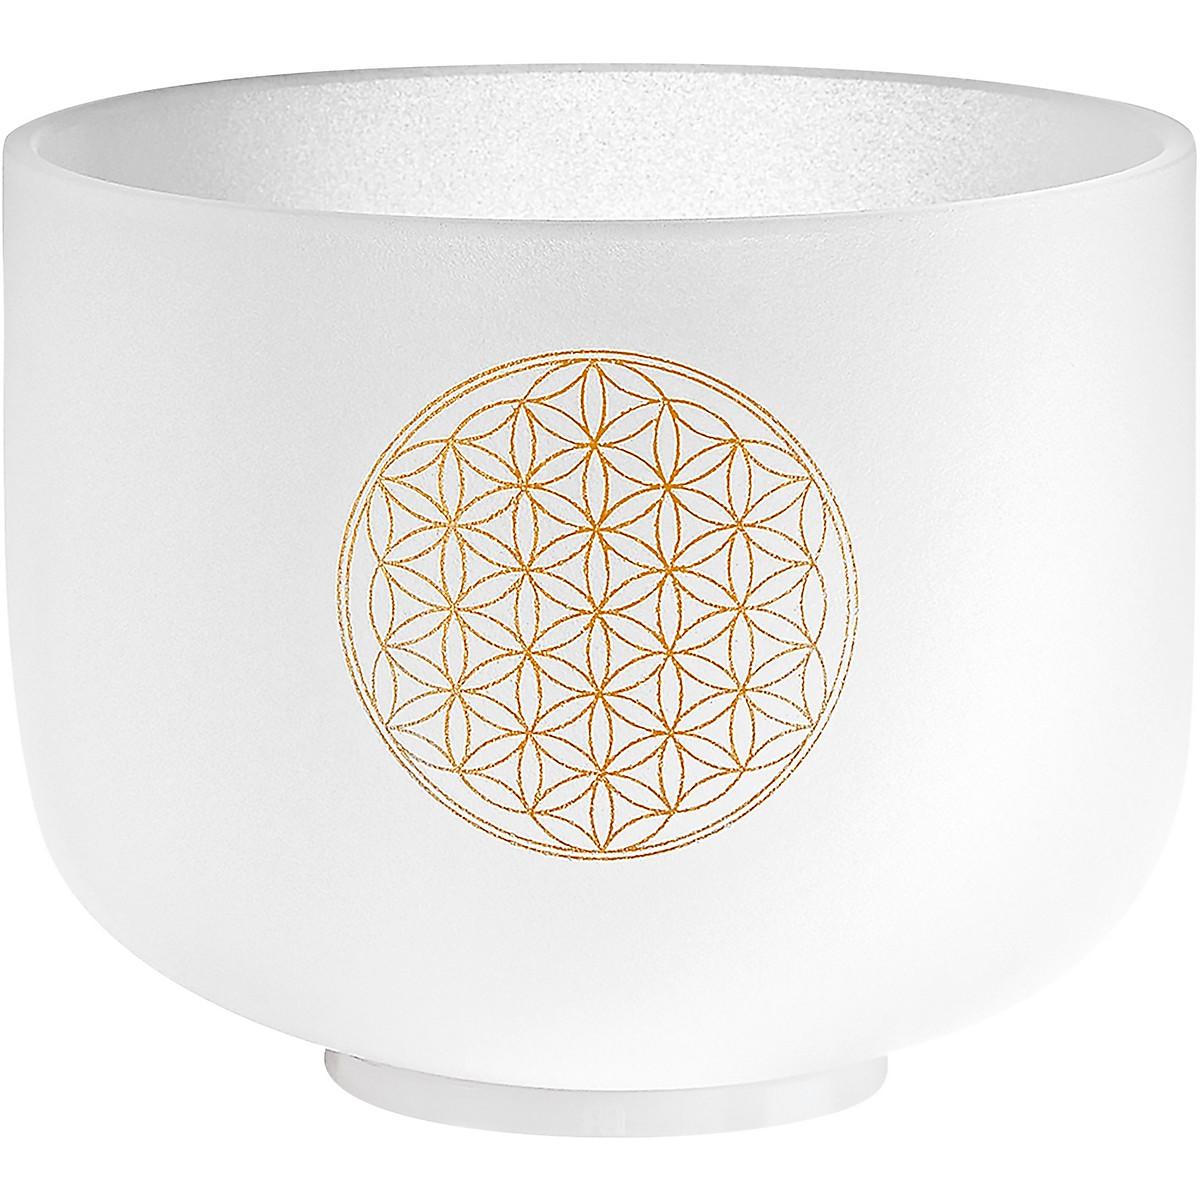 Meinl Sonic Energy Crystal Singing Bowl, Flower of Life